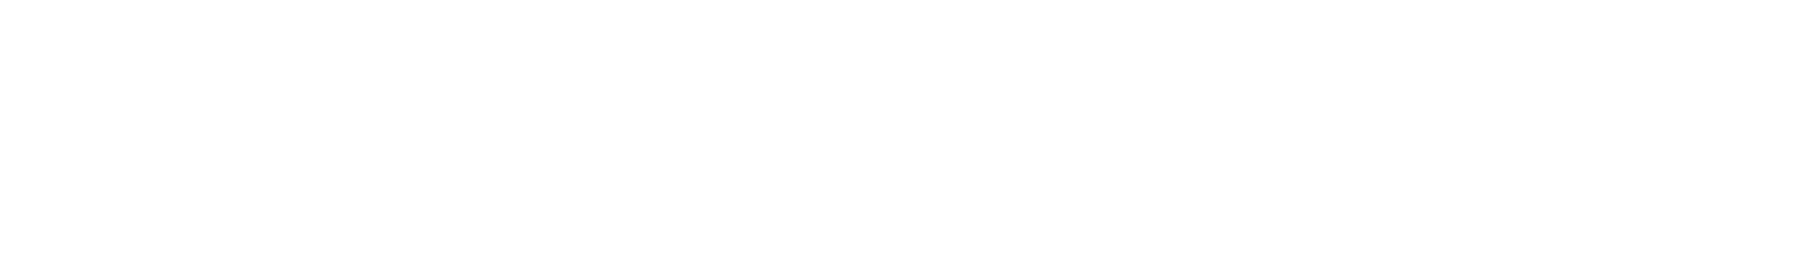 shs ch musicloop 125 epiano2 am